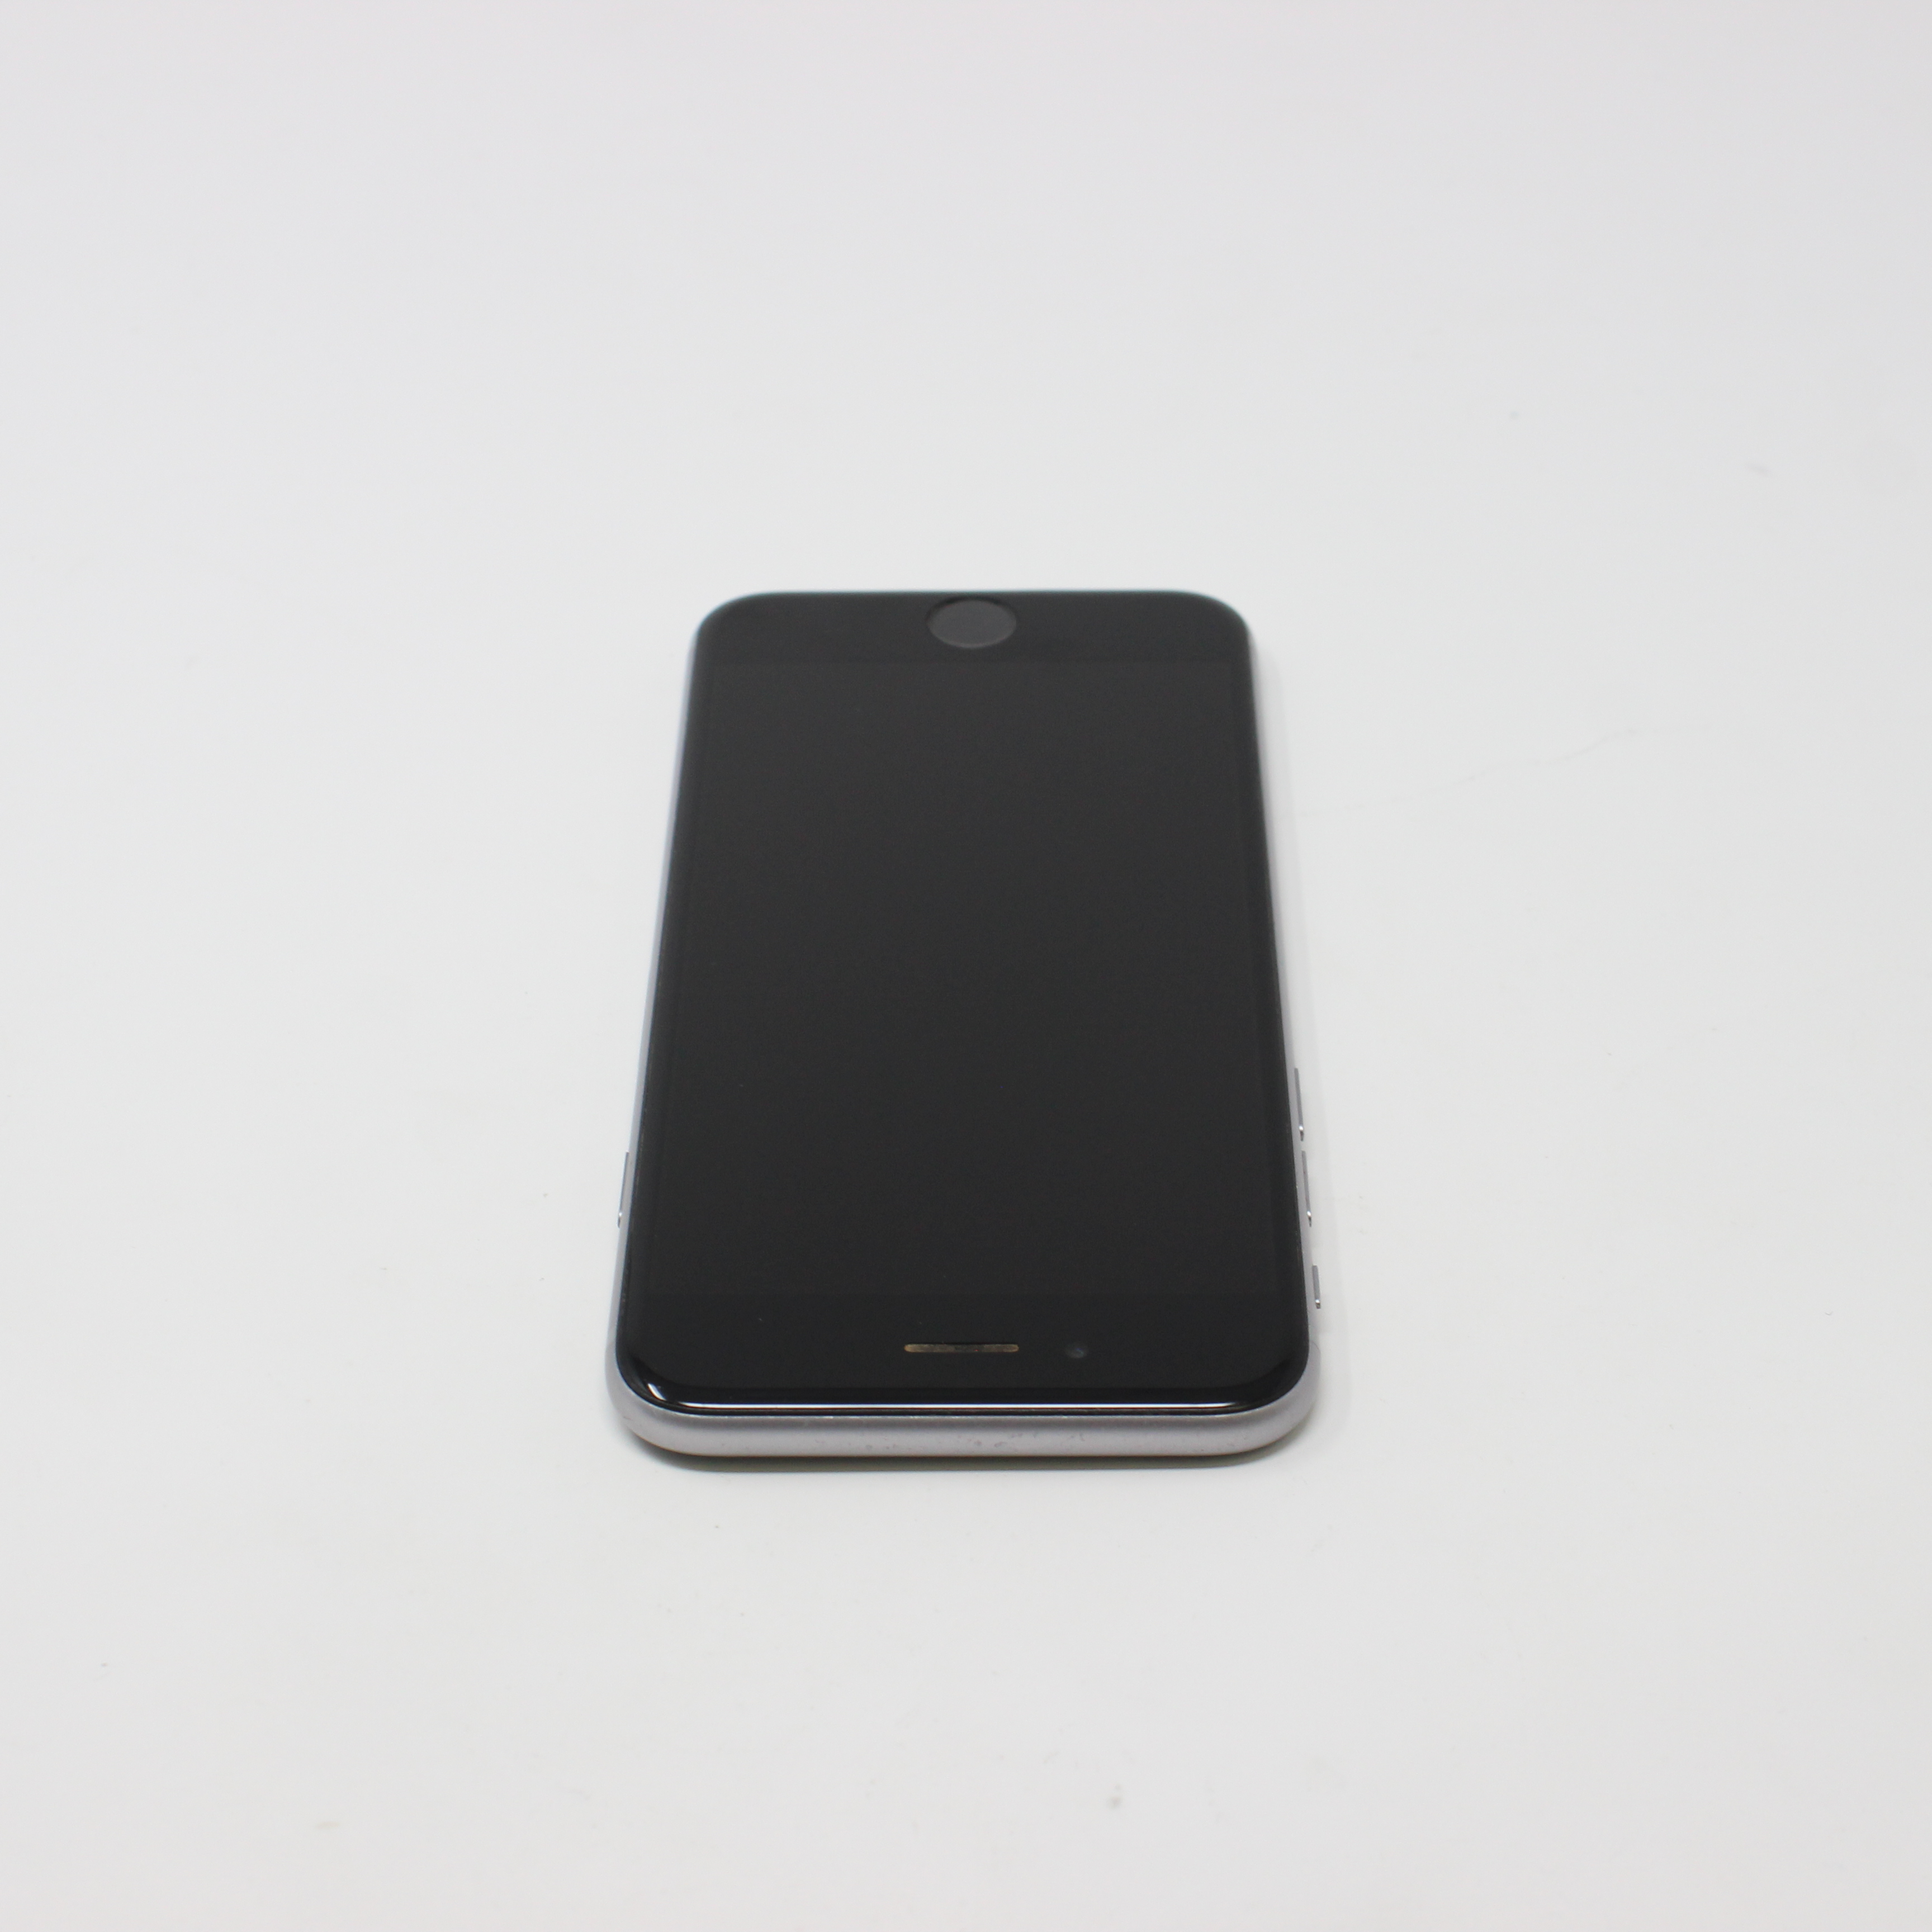 iPhone 6S 16GB Space Gray - Unlocked photo 4 | UpTradeit.com